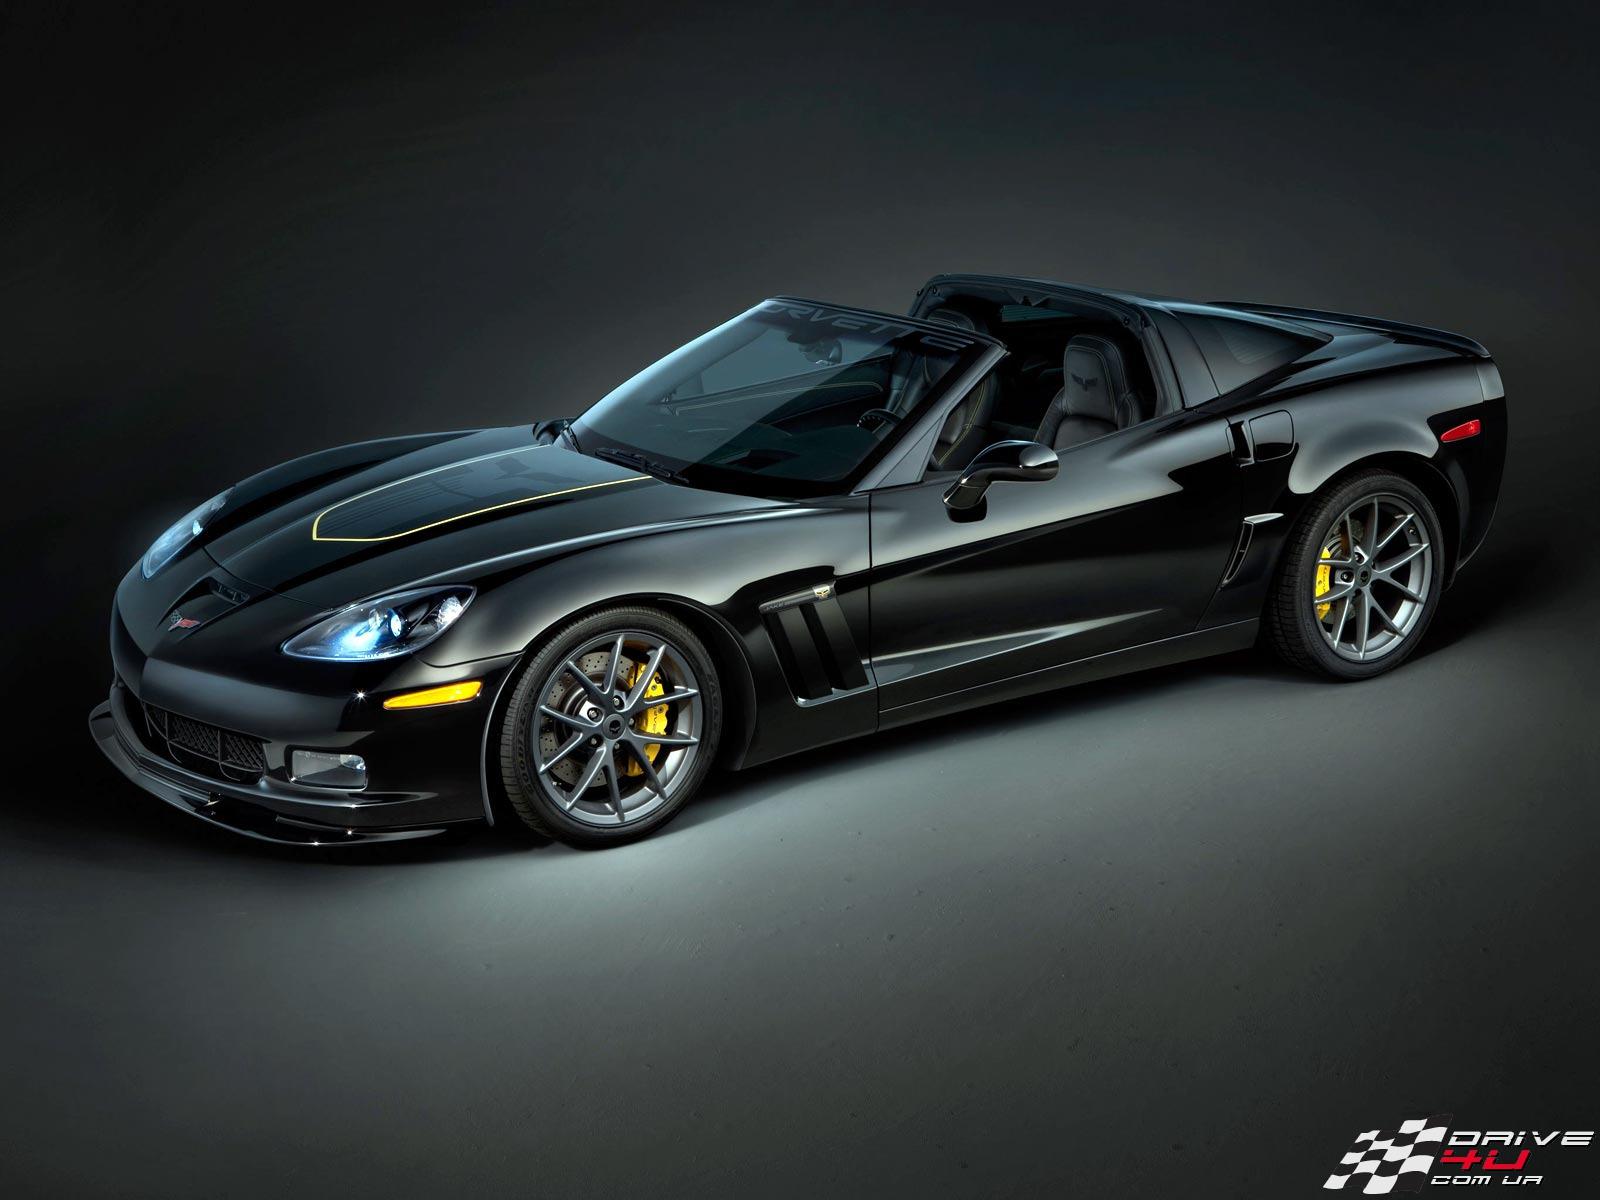 Corvette HD Desktop Wallpapers Hd Wallpapers 1600x1200